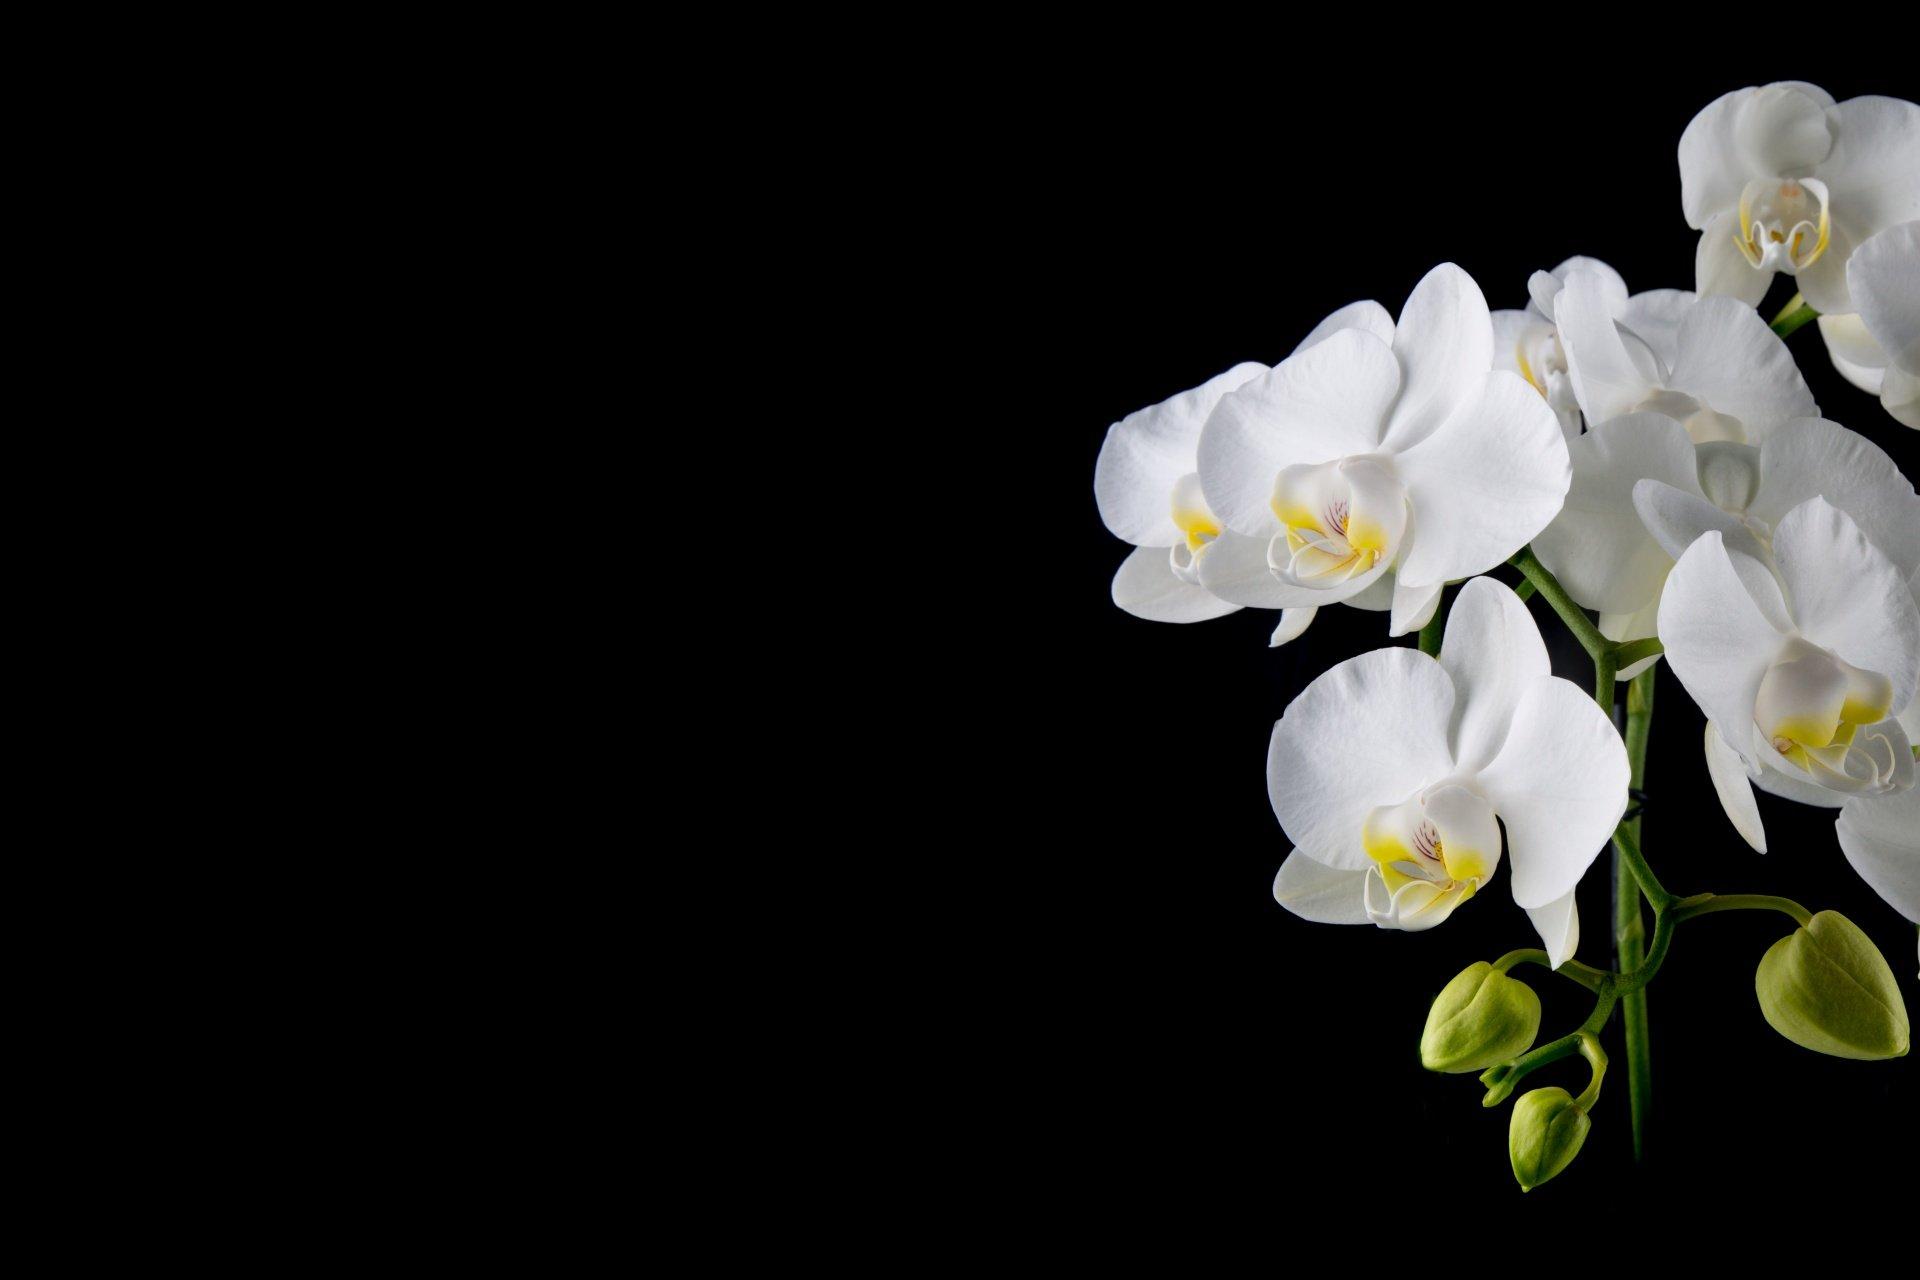 словам картинка белой орхидеи на сером фоне картинке